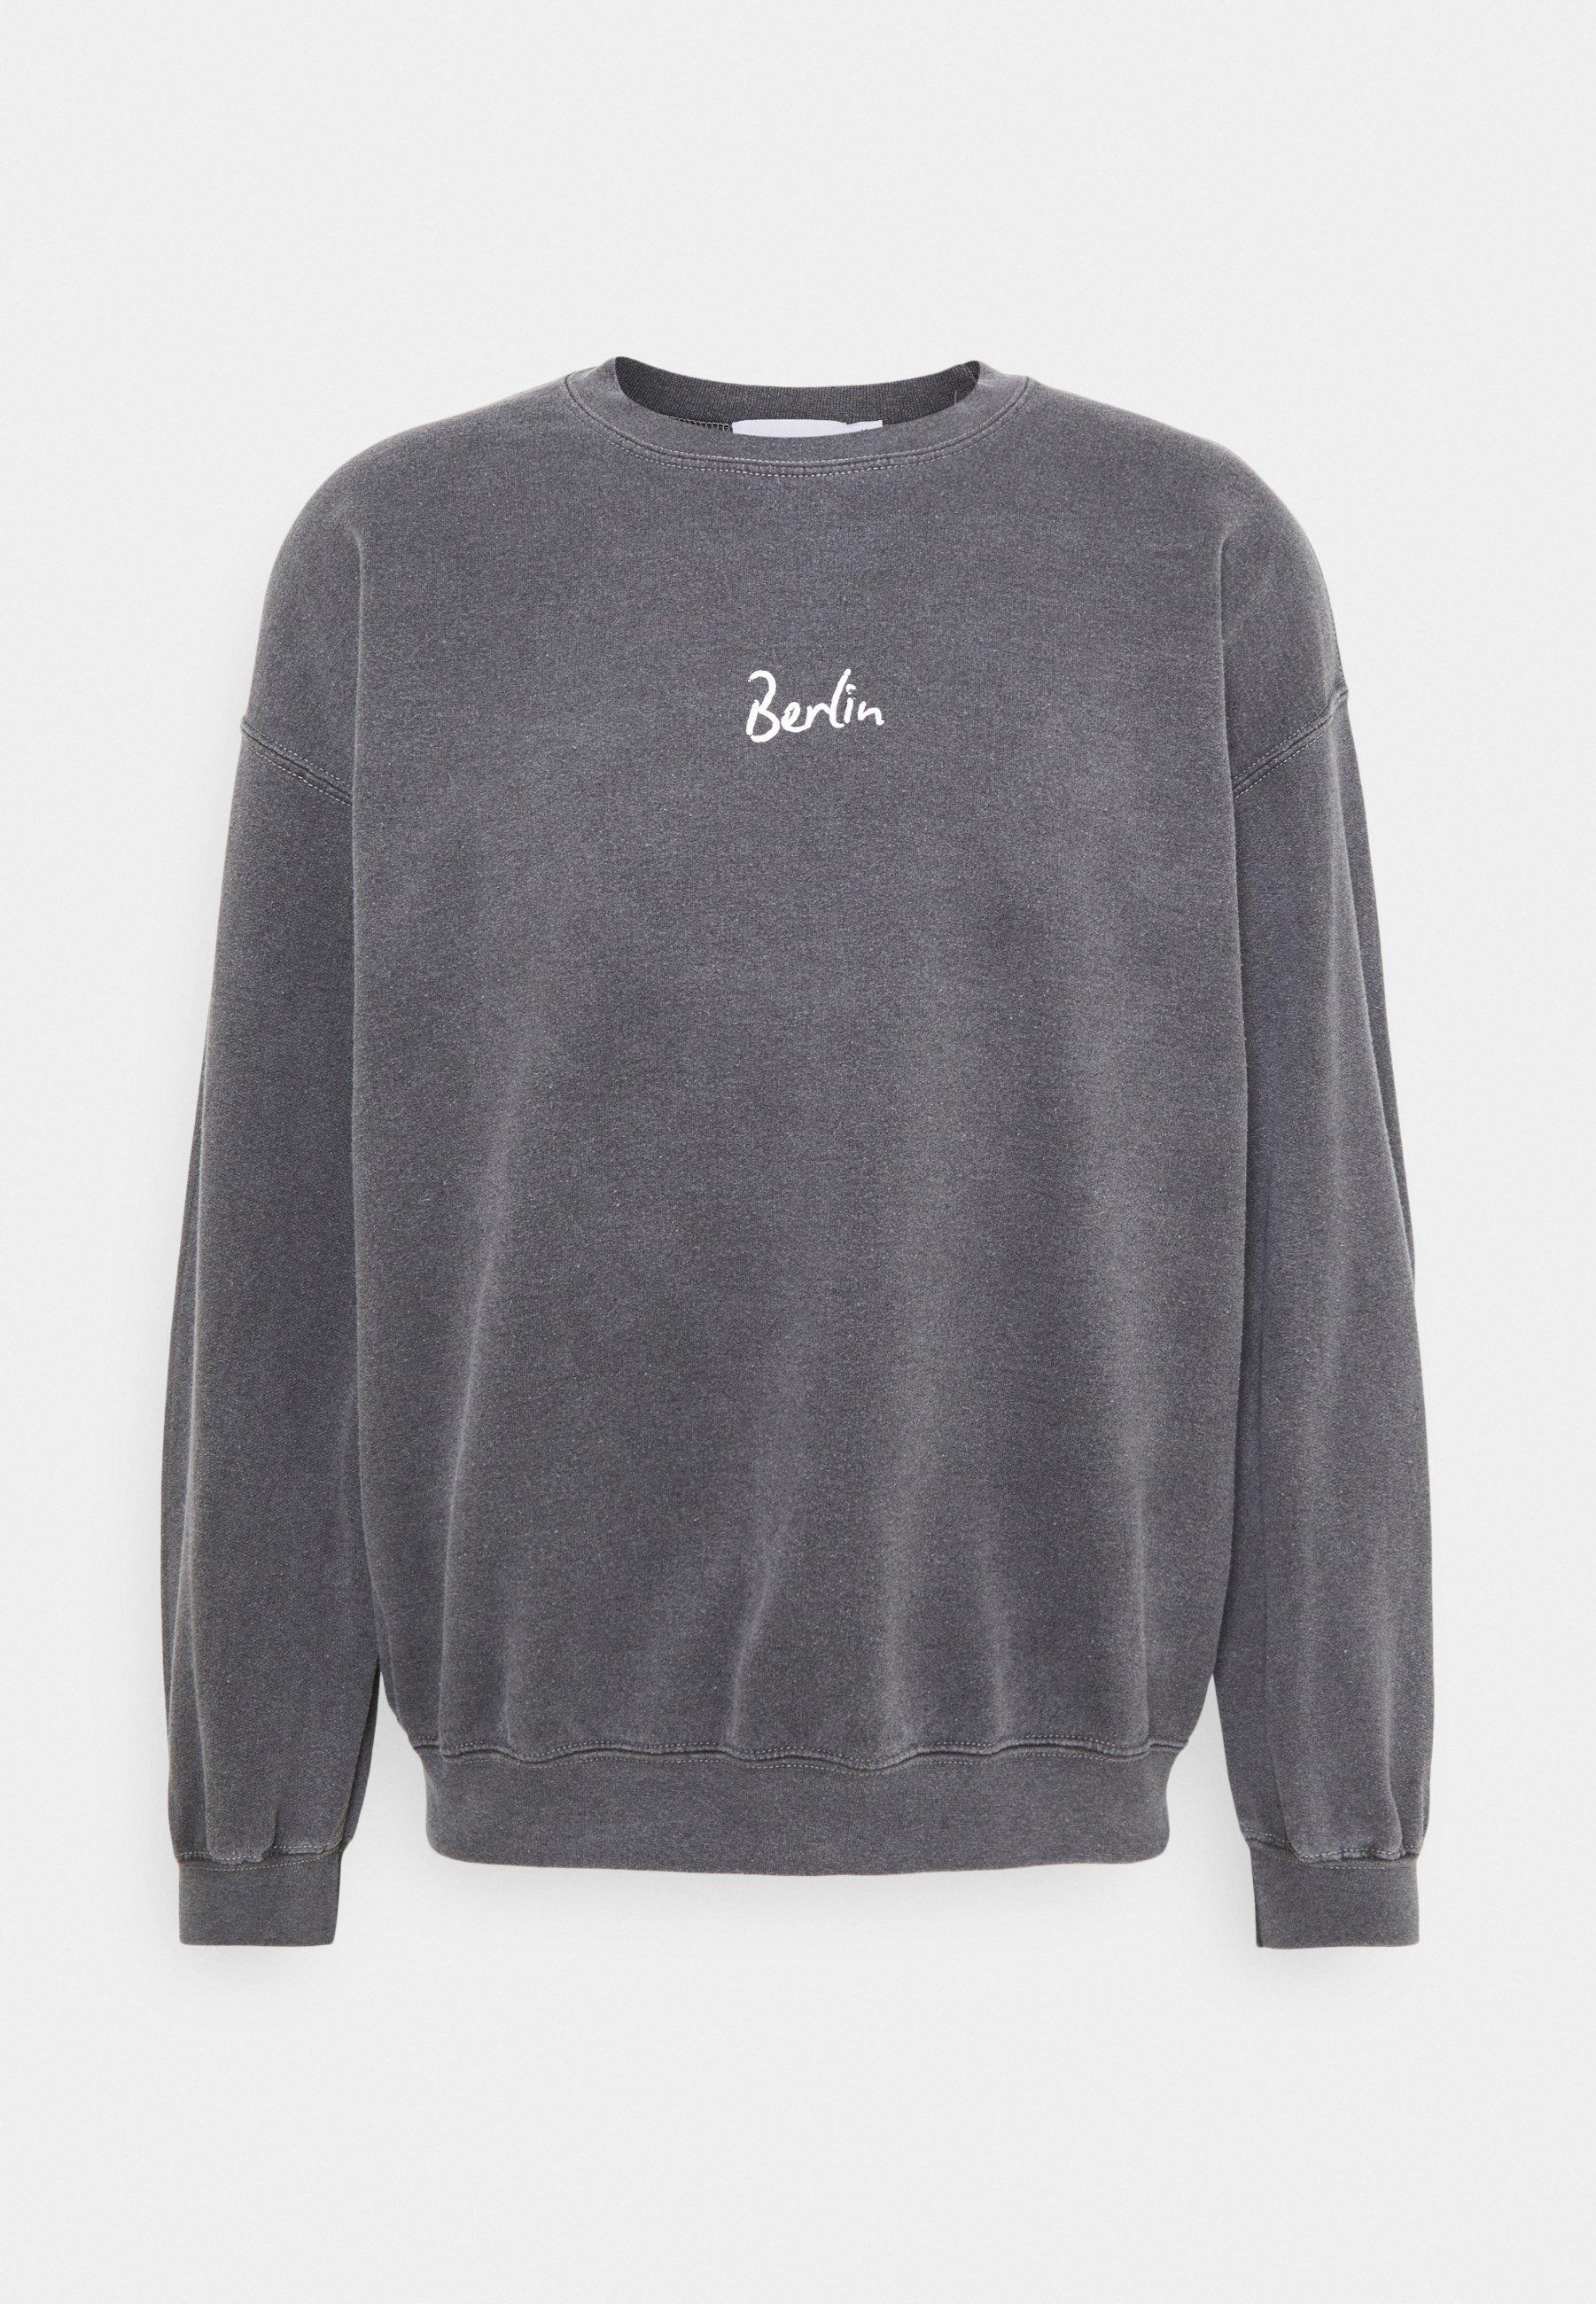 Women BERLIN BIRO PRINT UNISEX - Sweatshirt